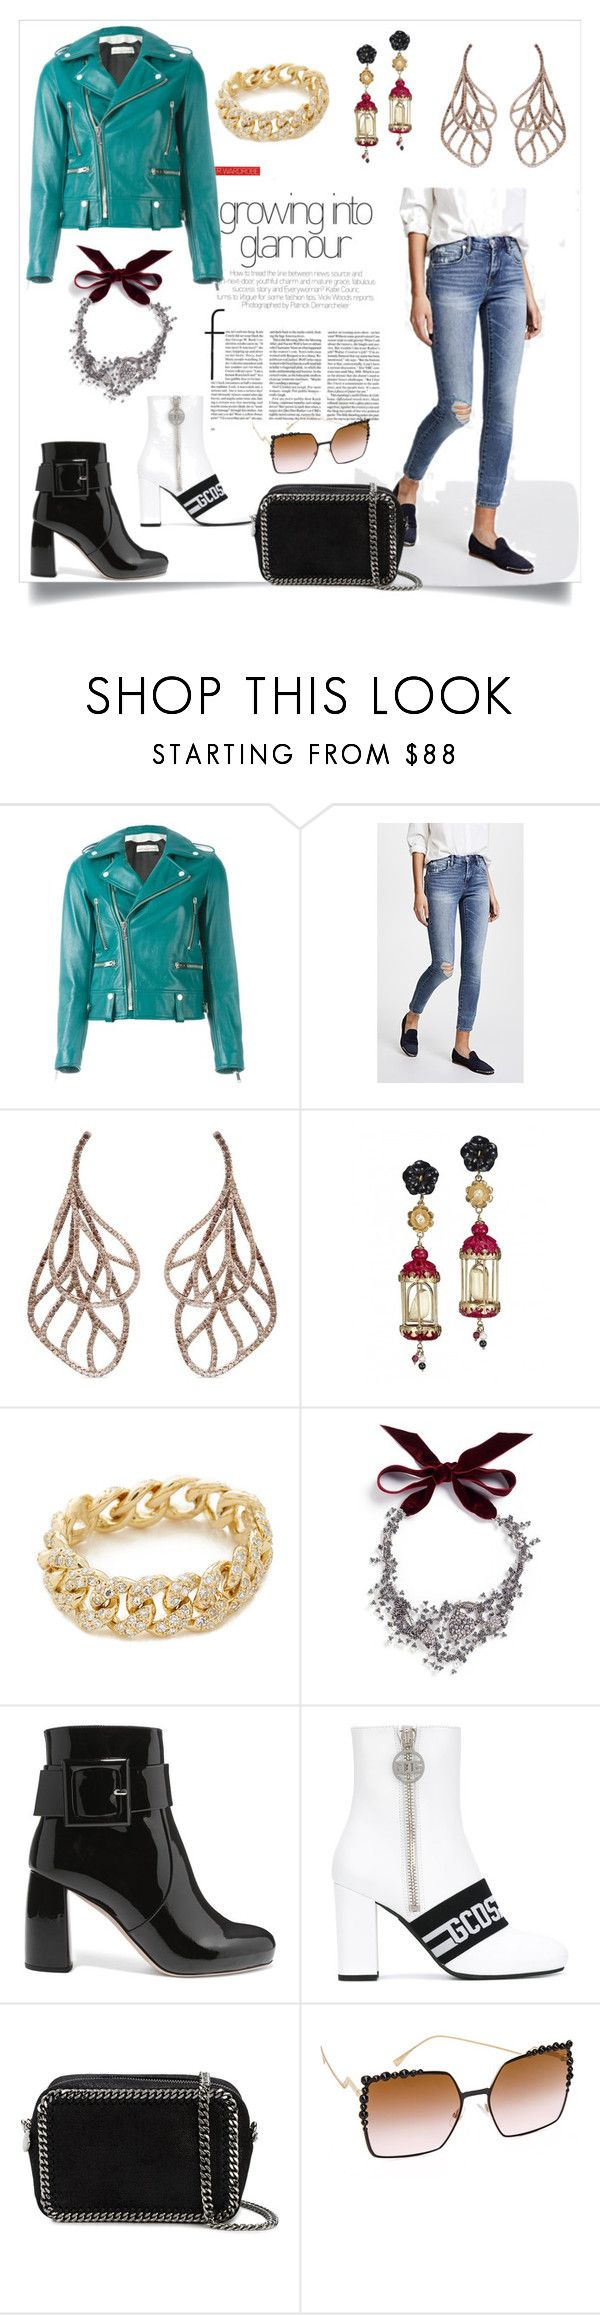 """fashion Garrage"" by kate-winslet-143 ❤ liked on Polyvore featuring Golden Goose, Blank Denim, Anyallerie, Of Rare Origin, Shay, Lulu Frost, Miu Miu, GCDS, STELLA McCARTNEY and Fendi"